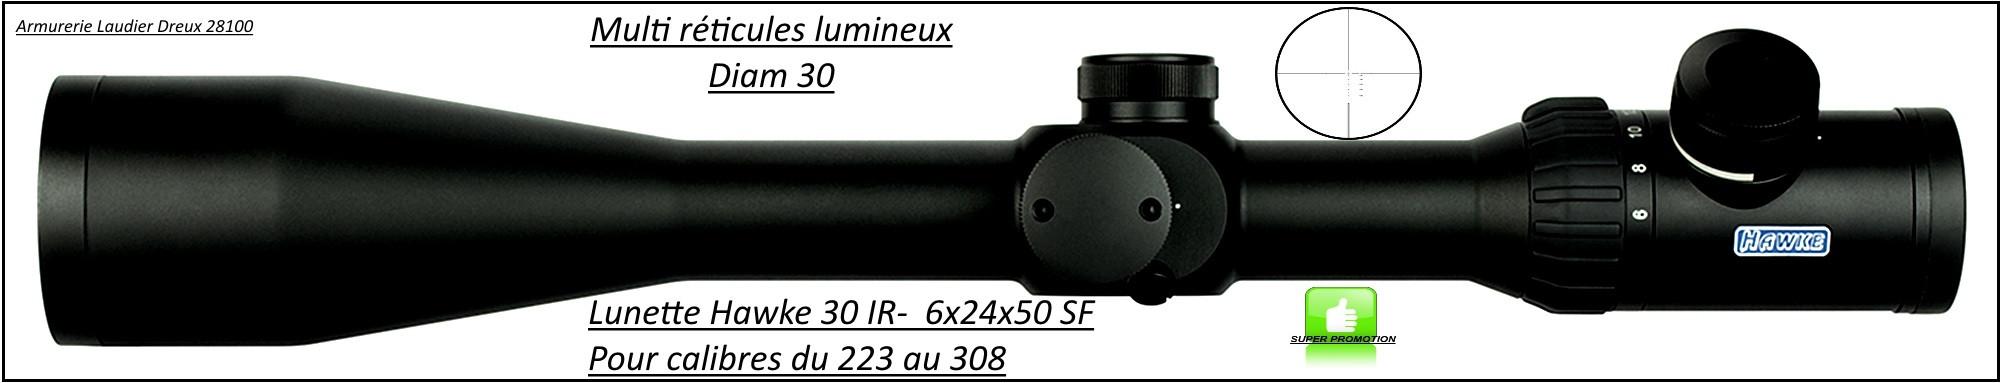 Lunette -Hawke Optics- Endurance 30 IR-6-24x24x50 SF-Pour cal 223 à 308 w -Ref 23825